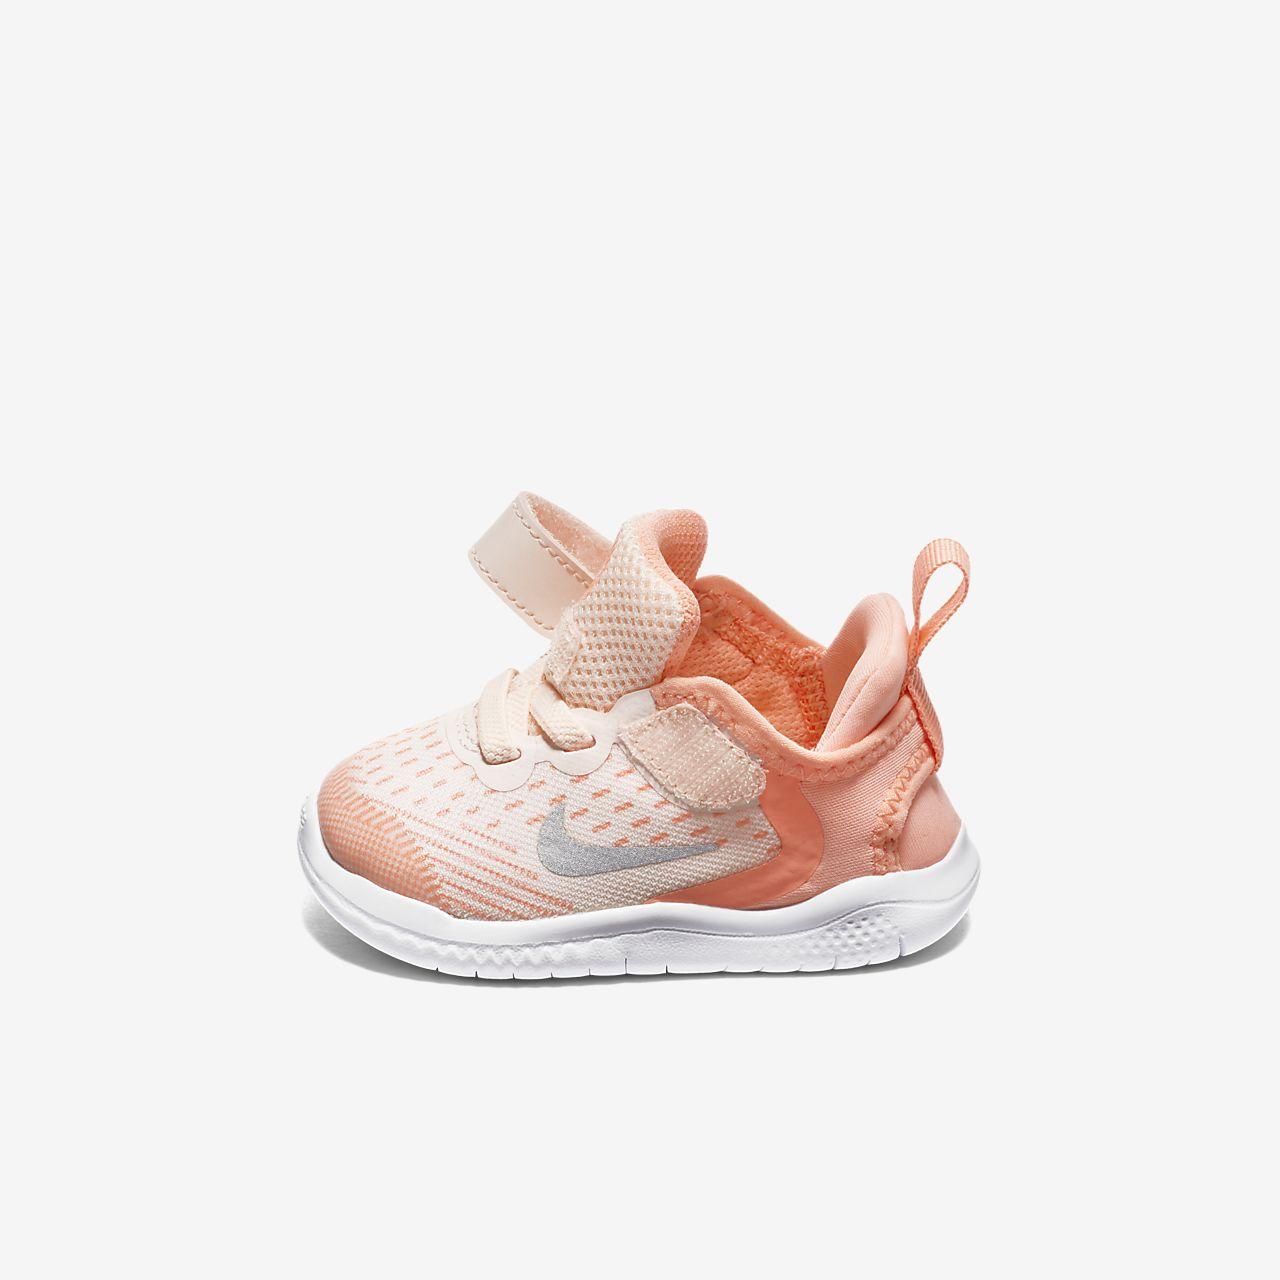 a9d929b74c36 Nike Free RN 2018 Baby  amp  Toddler Shoe. Nike.com CA